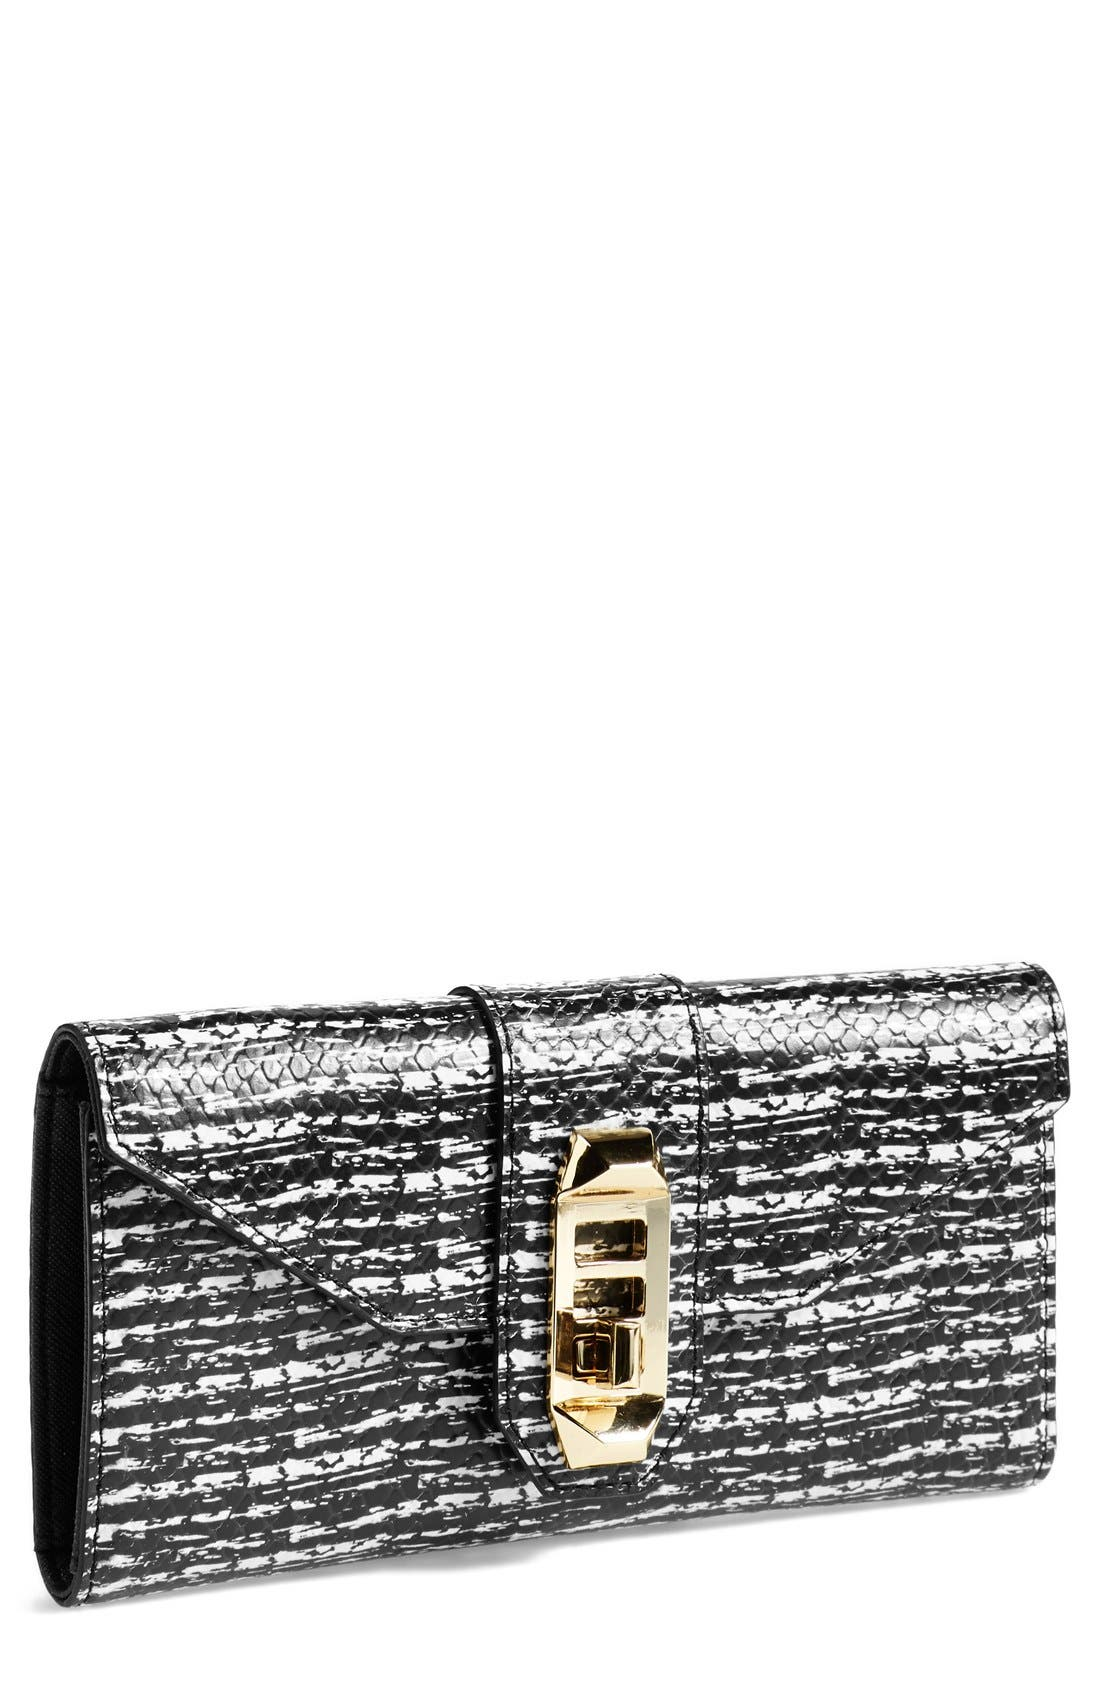 Main Image - Rebecca Minkoff 'Mason' Snake Embossed Turnlock Wallet